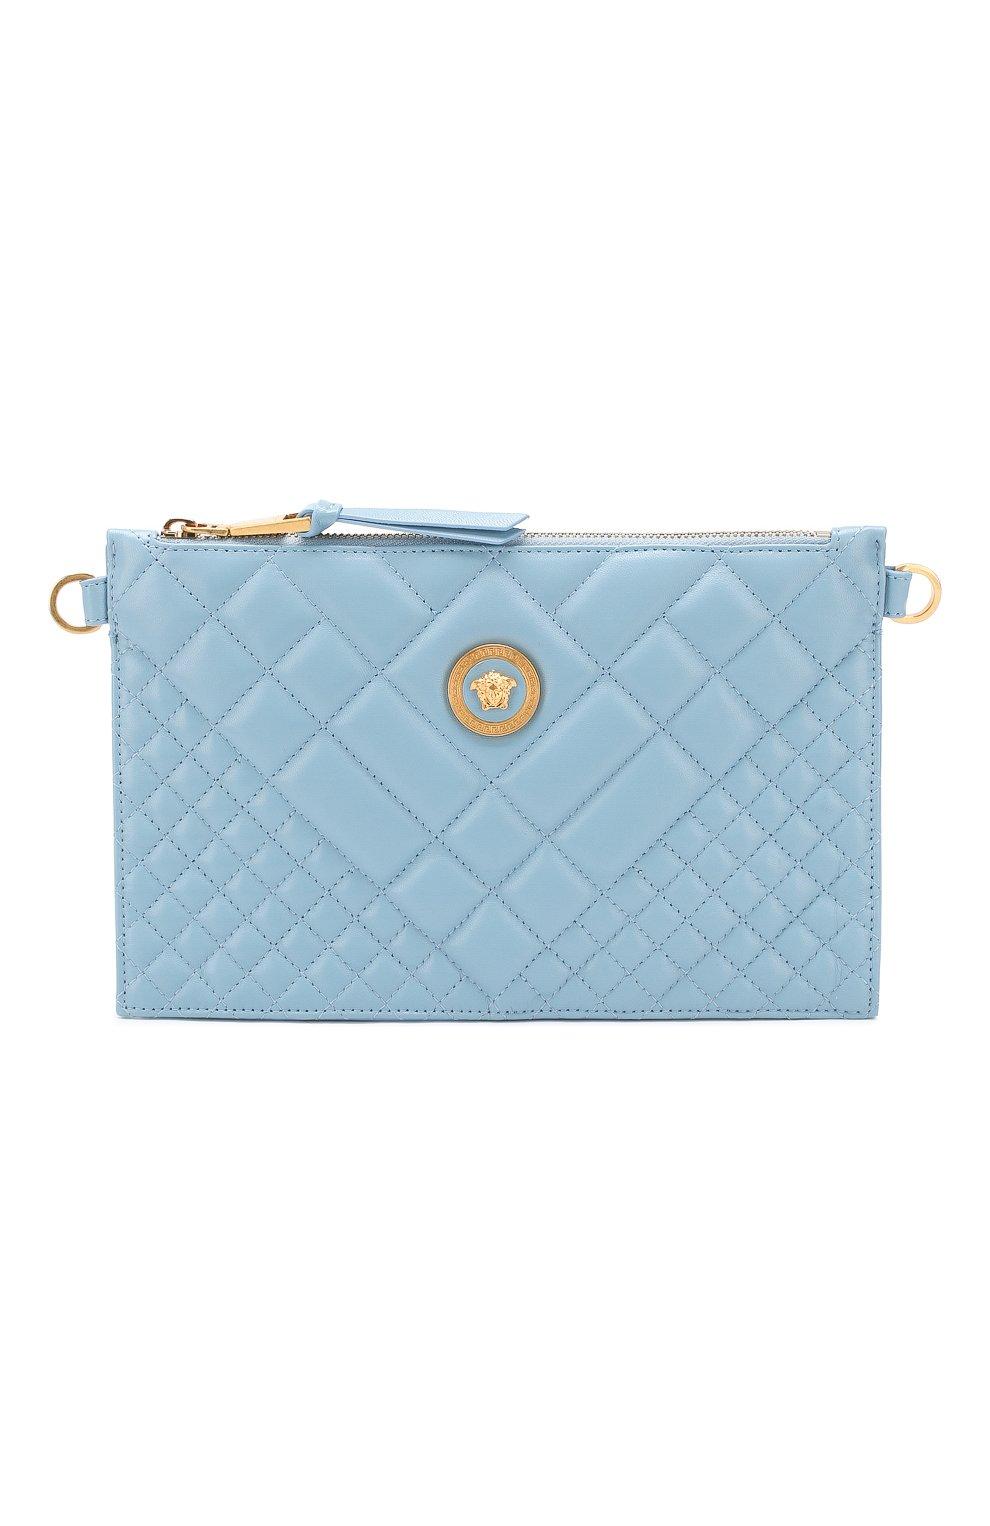 Сумка Quilted Versace голубая цвета   Фото №1